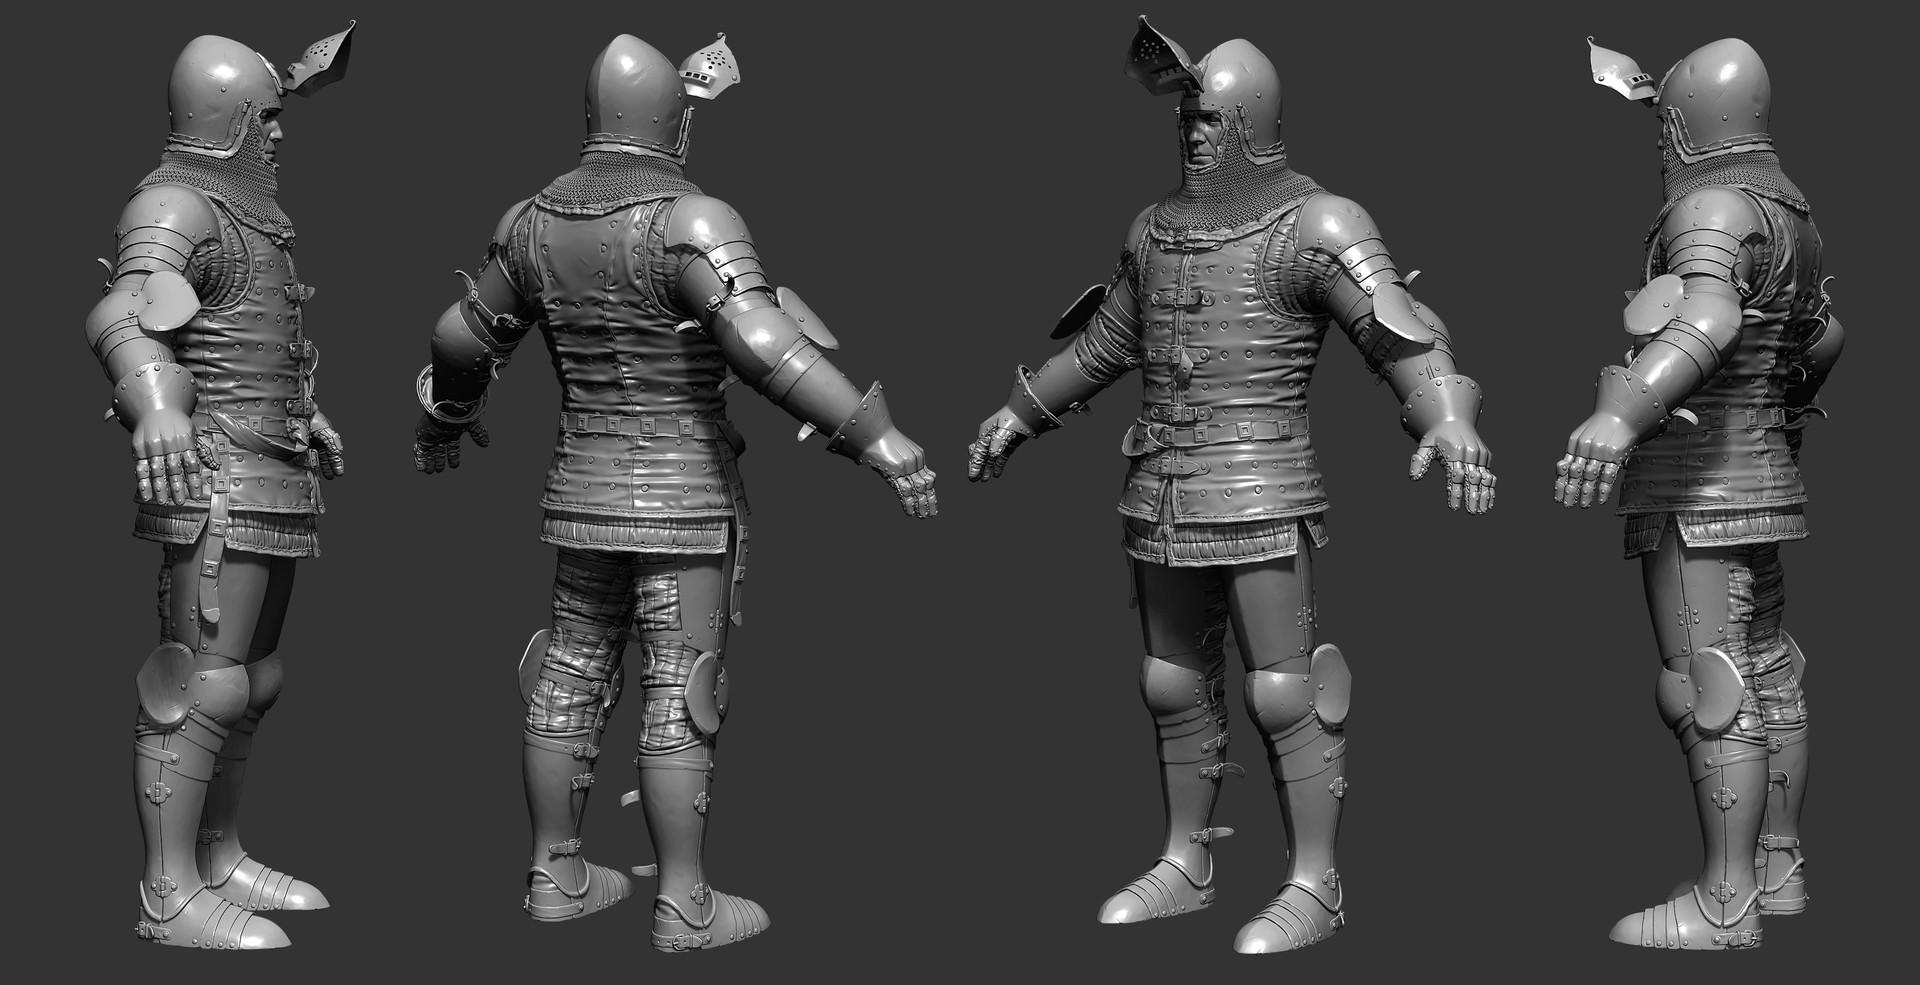 Petr sokolov artpity knight tpose sides